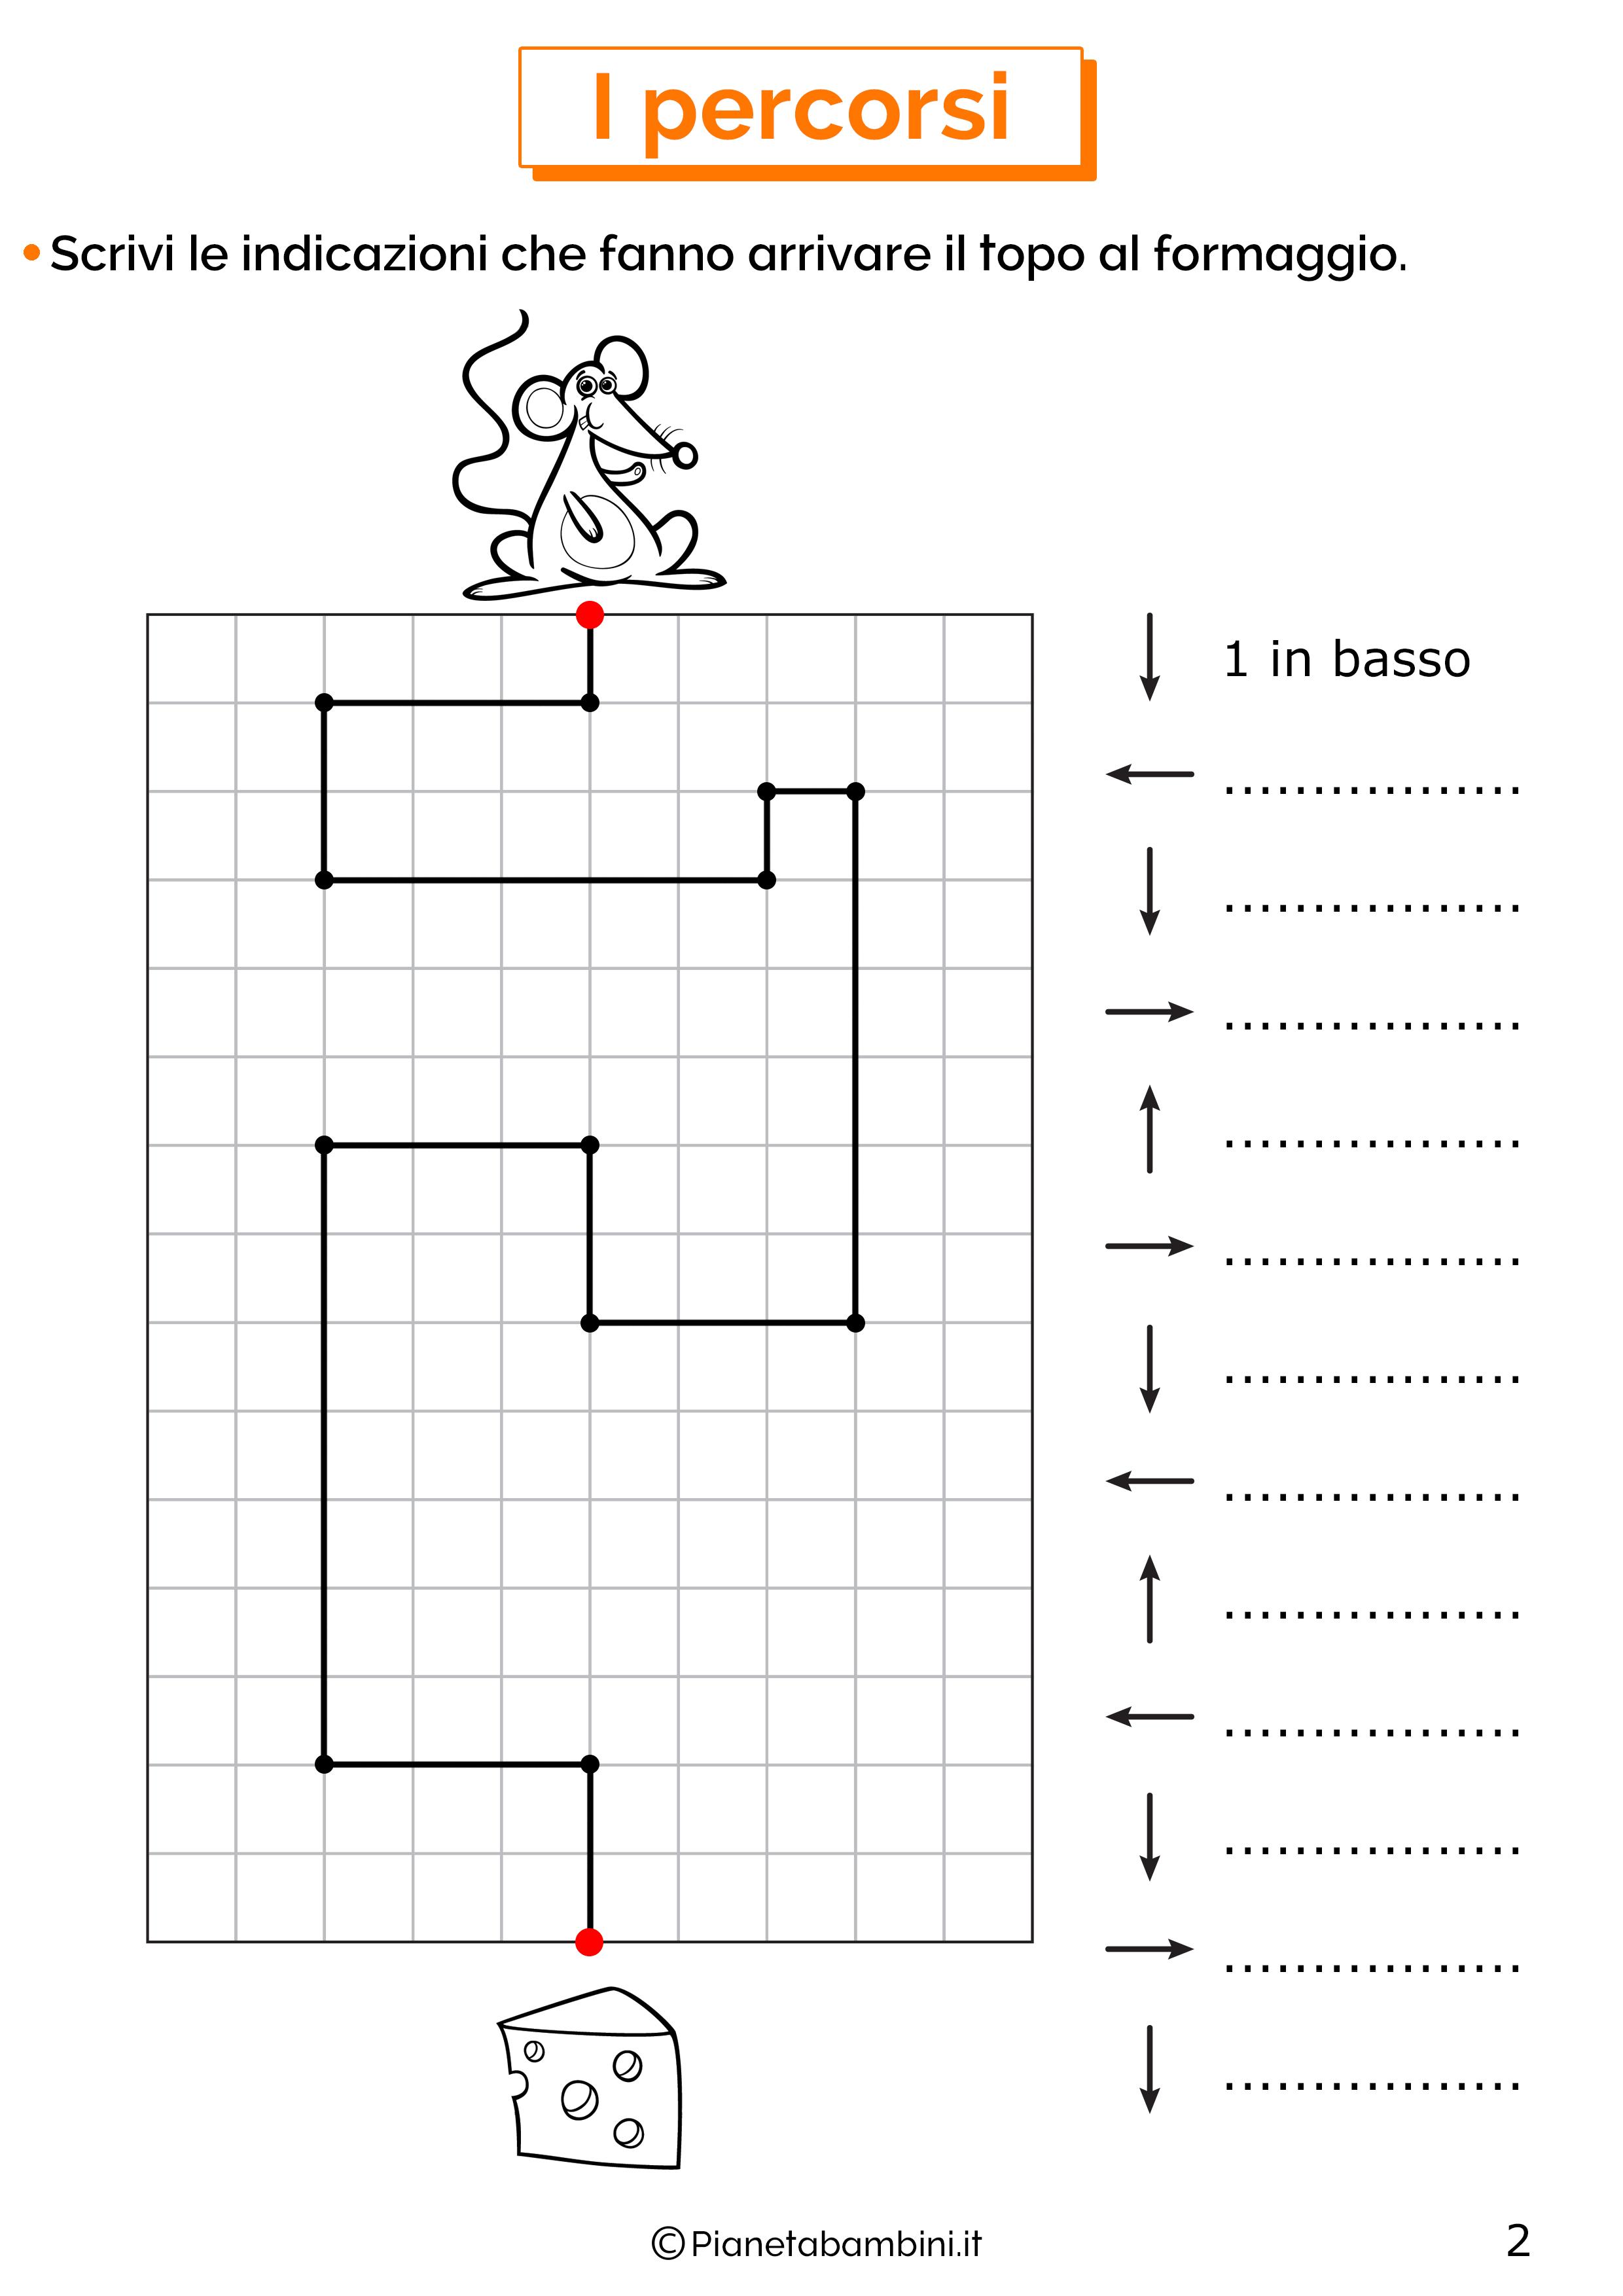 Esercizi sui percorsi di matematica 2